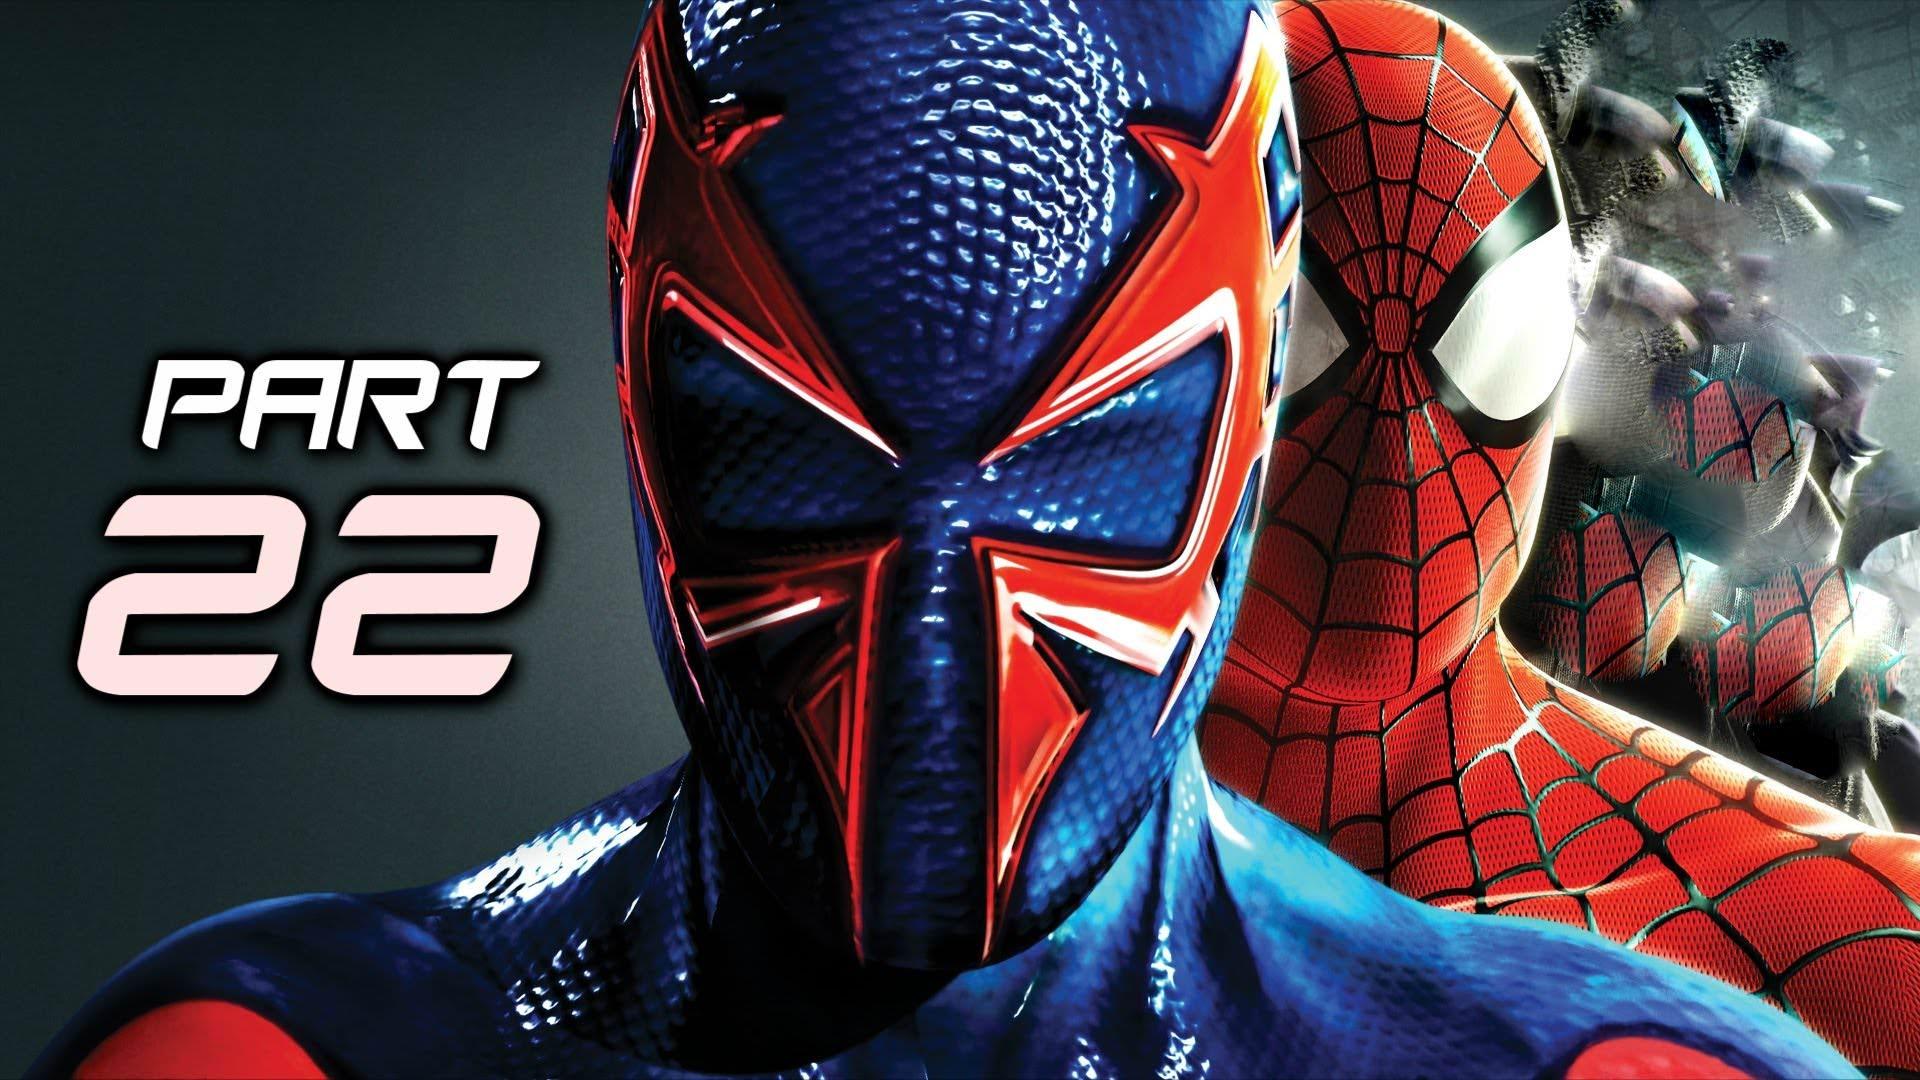 Spider Man 2099 Wallpaper On Wallpaperget Com: Spider Man 2099 Wallpapers HD